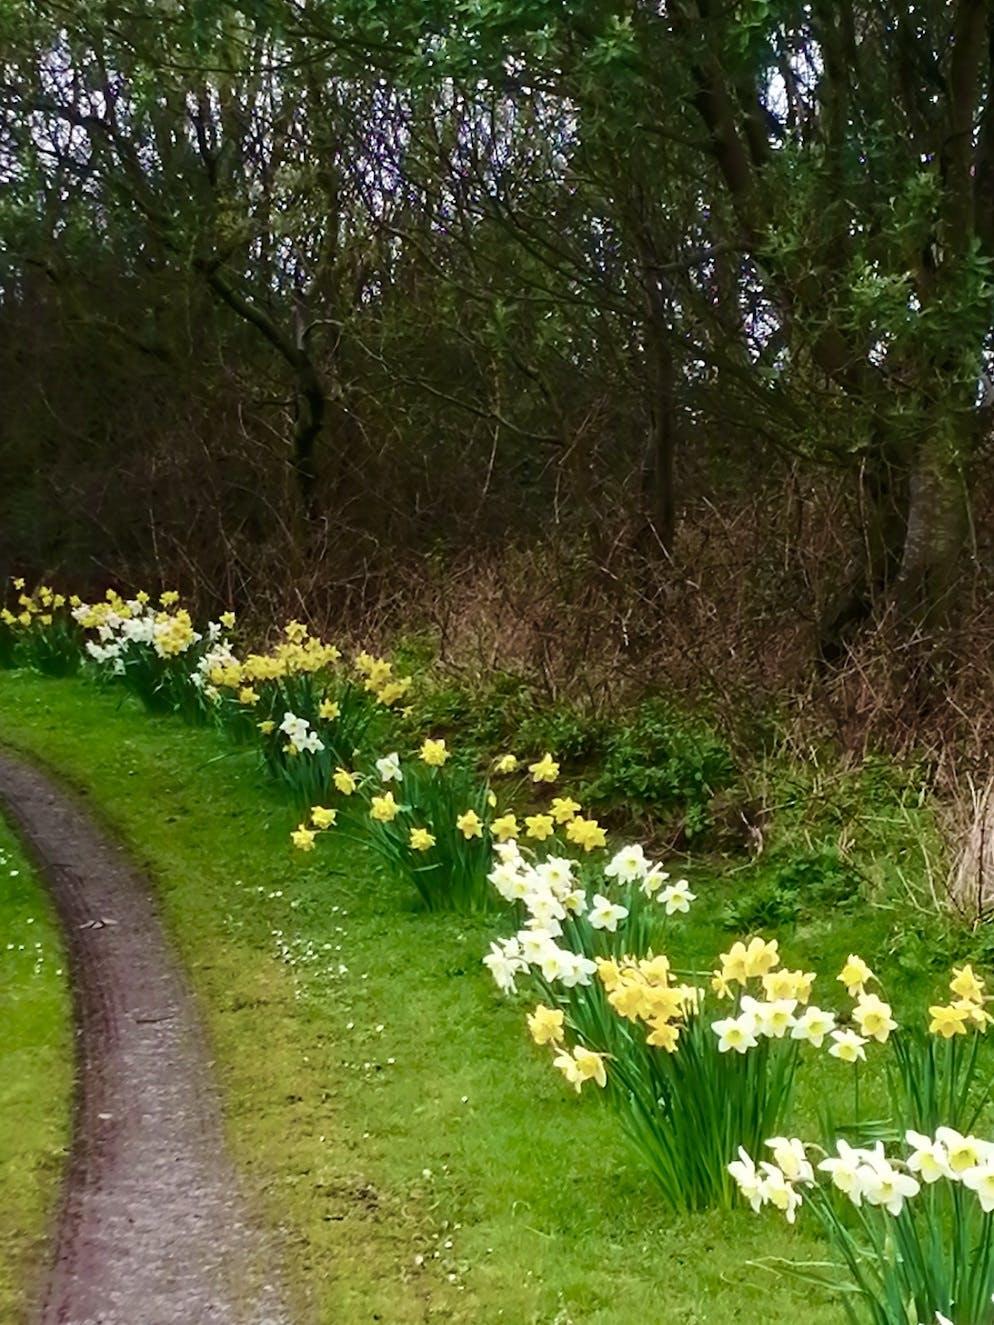 Plenty of daffodils in bloom at Bodfan